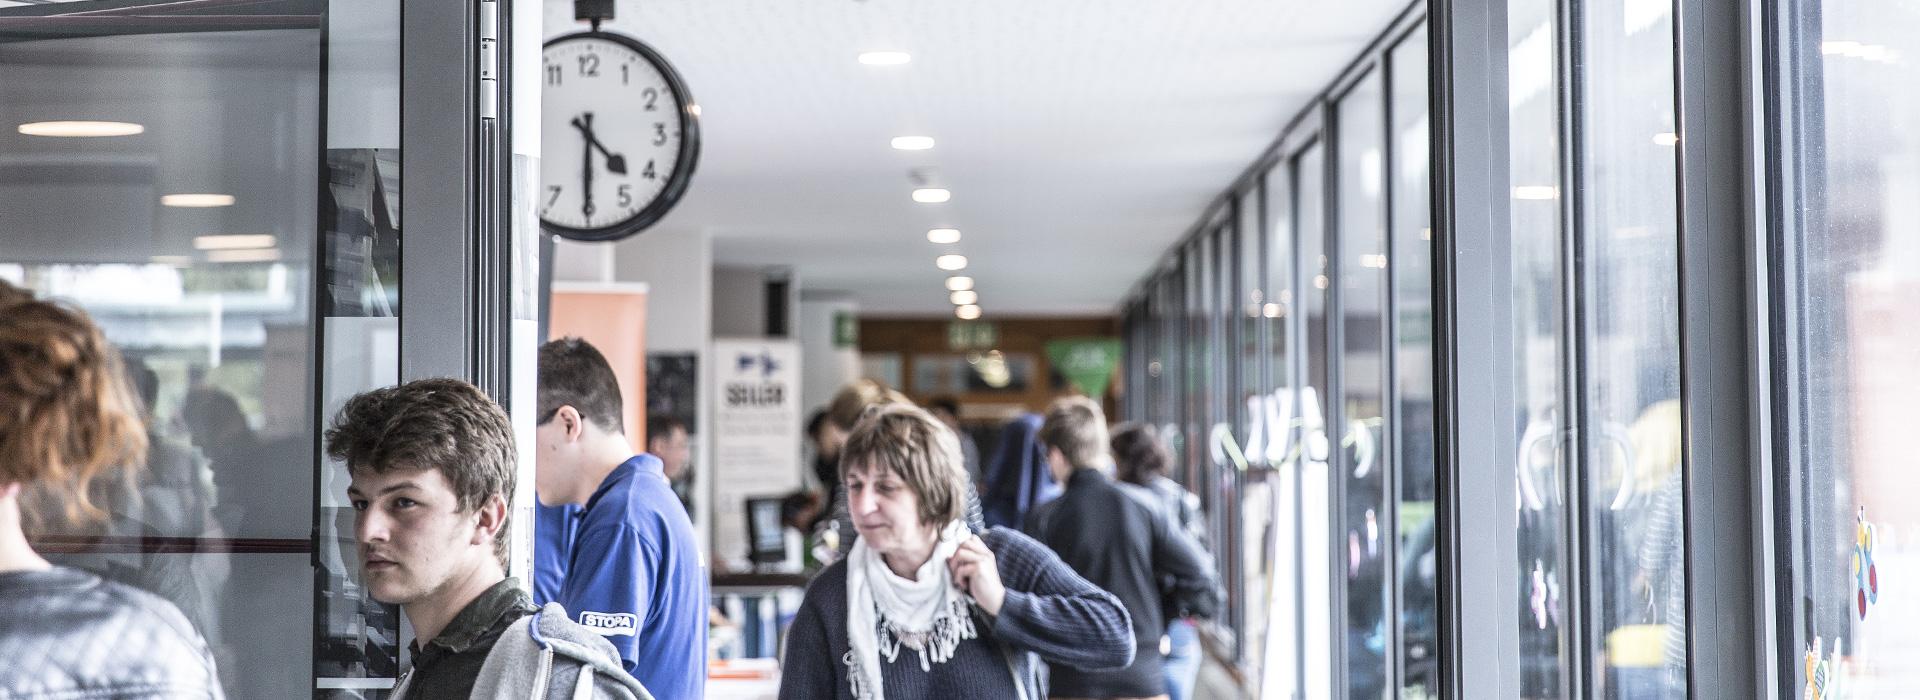 Ausbildungsbörse 2017 in Ottersweier